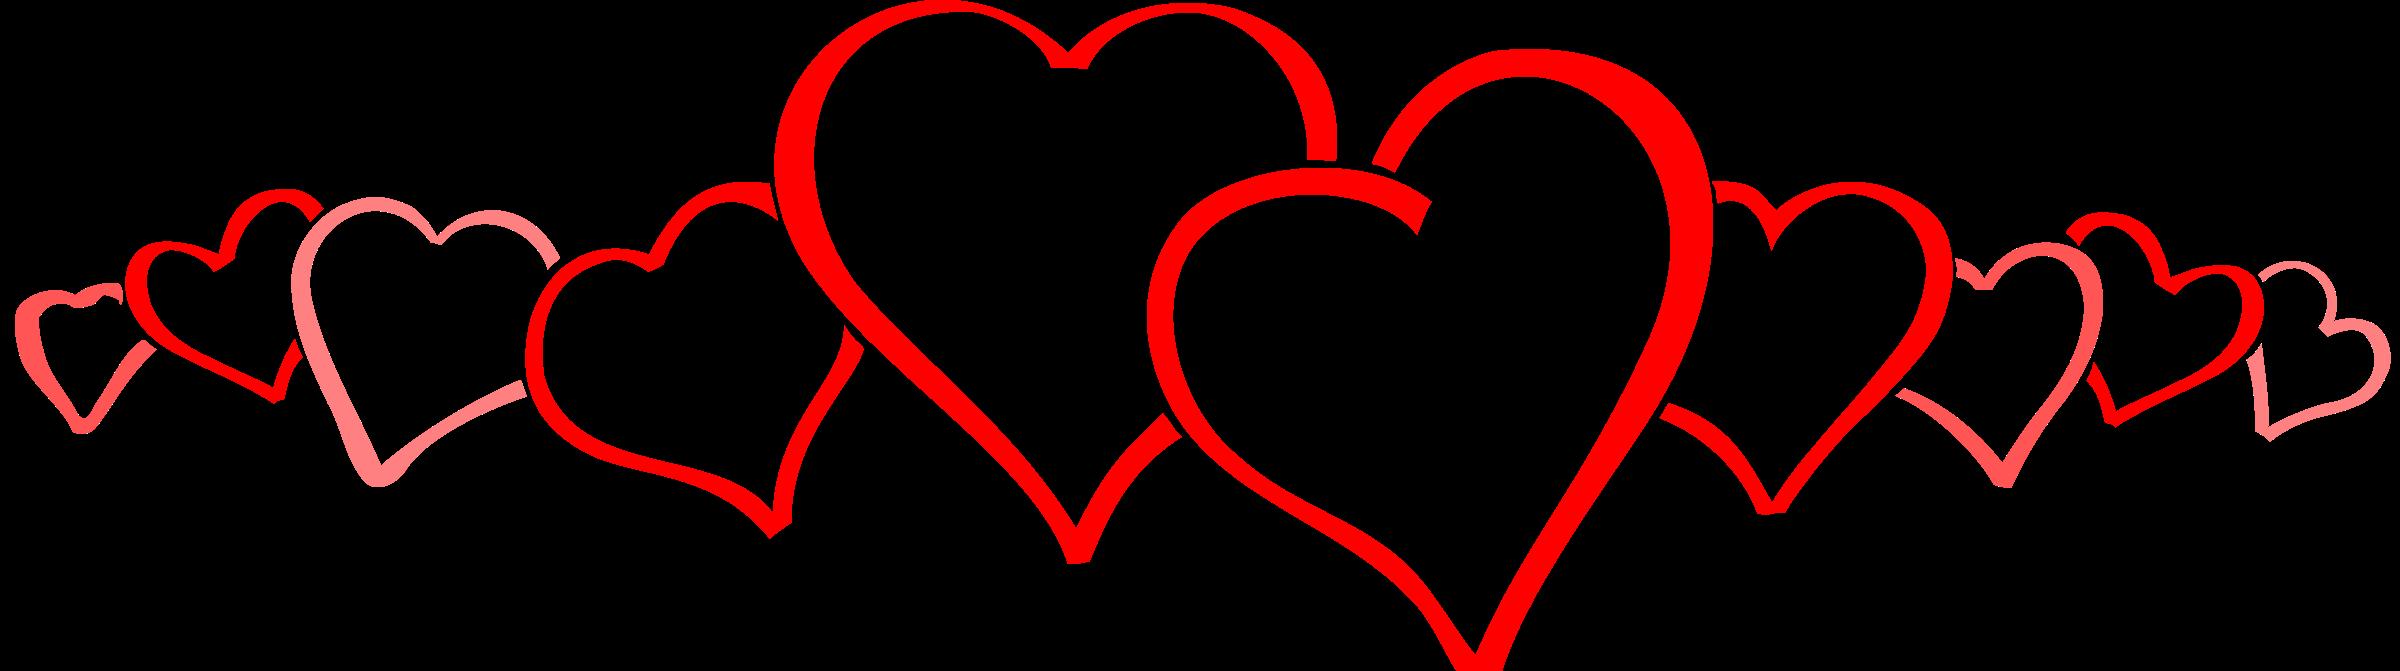 Clipart heart banner. Hearts